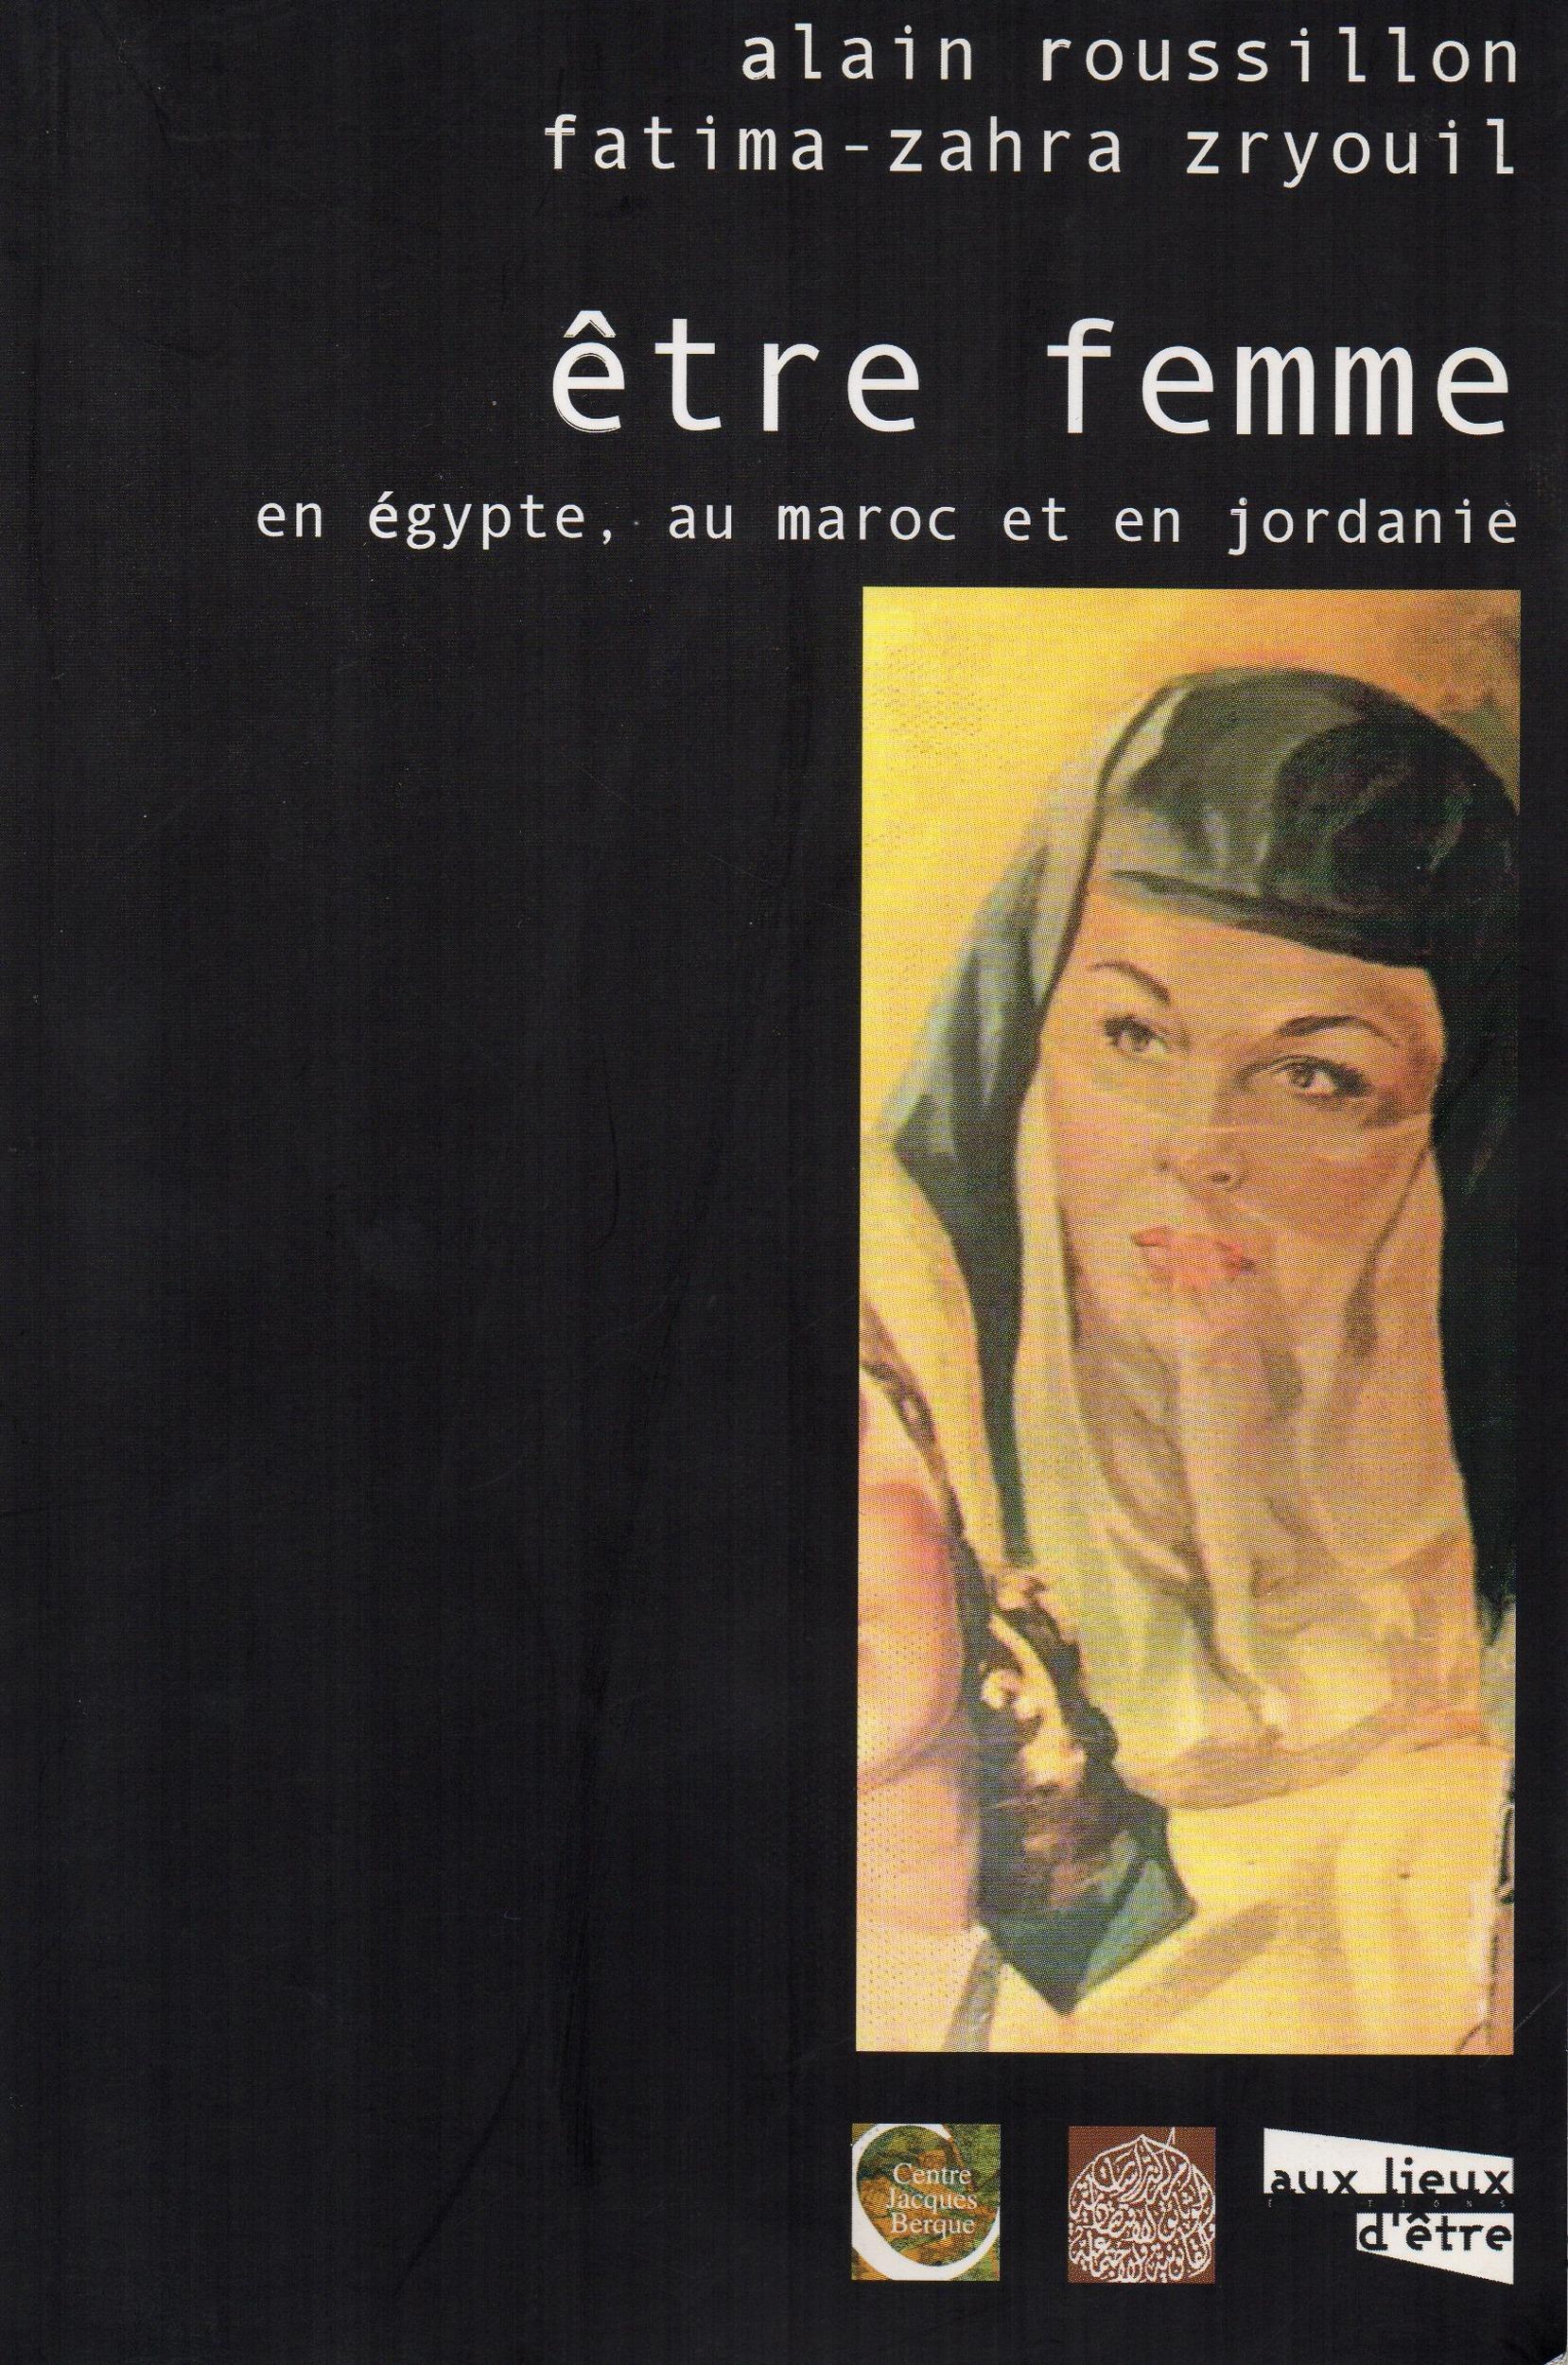 etre femme en egypte, au maroc et en jordanie